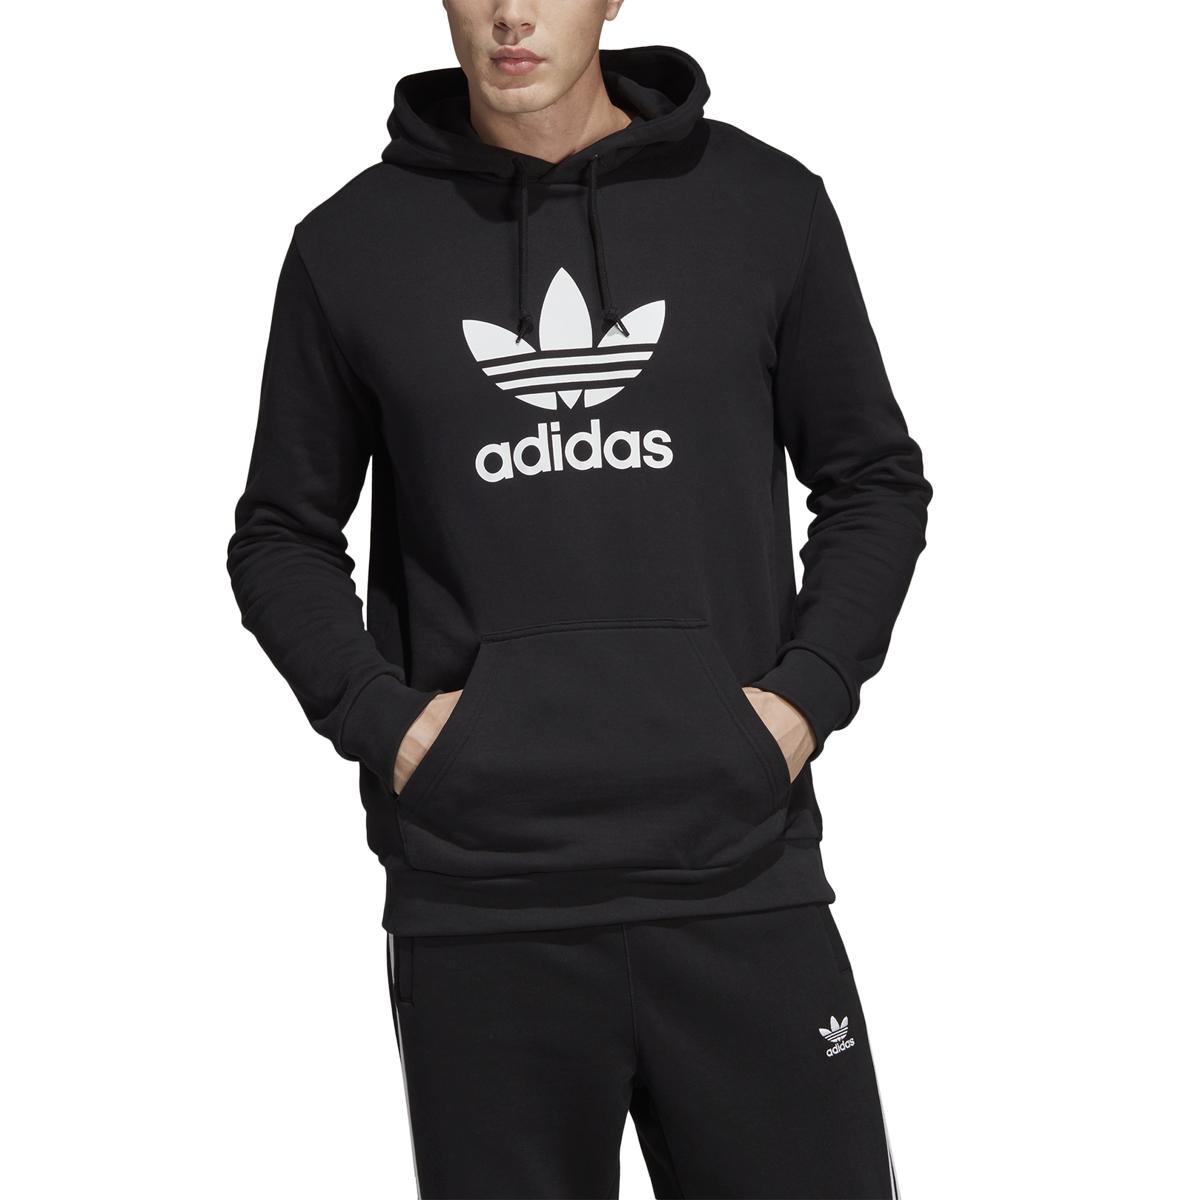 adidas Men's Trefoil Hoodie Medium Grey Heather, 2X Large